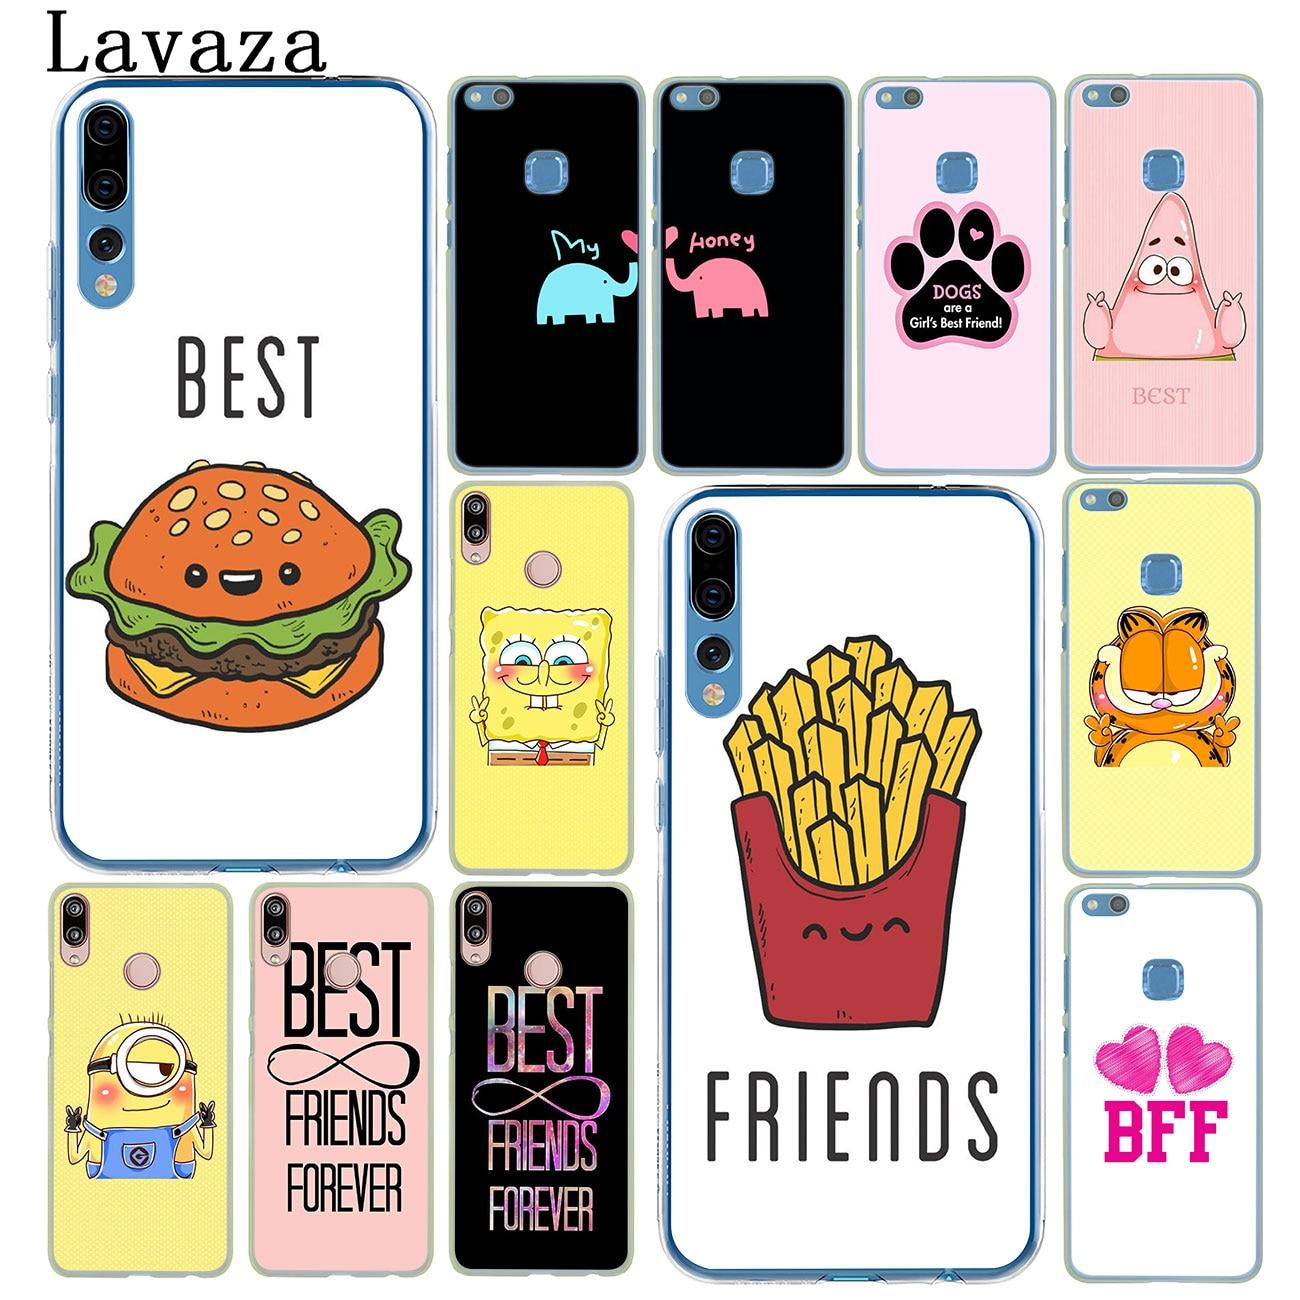 Lavaza Best Friends Girl Hard Phone Case for Huawei P30 P20 Pro P9 P10 Plus P8 Lite Mini 2016 2017 P smart Z 2019 Cover